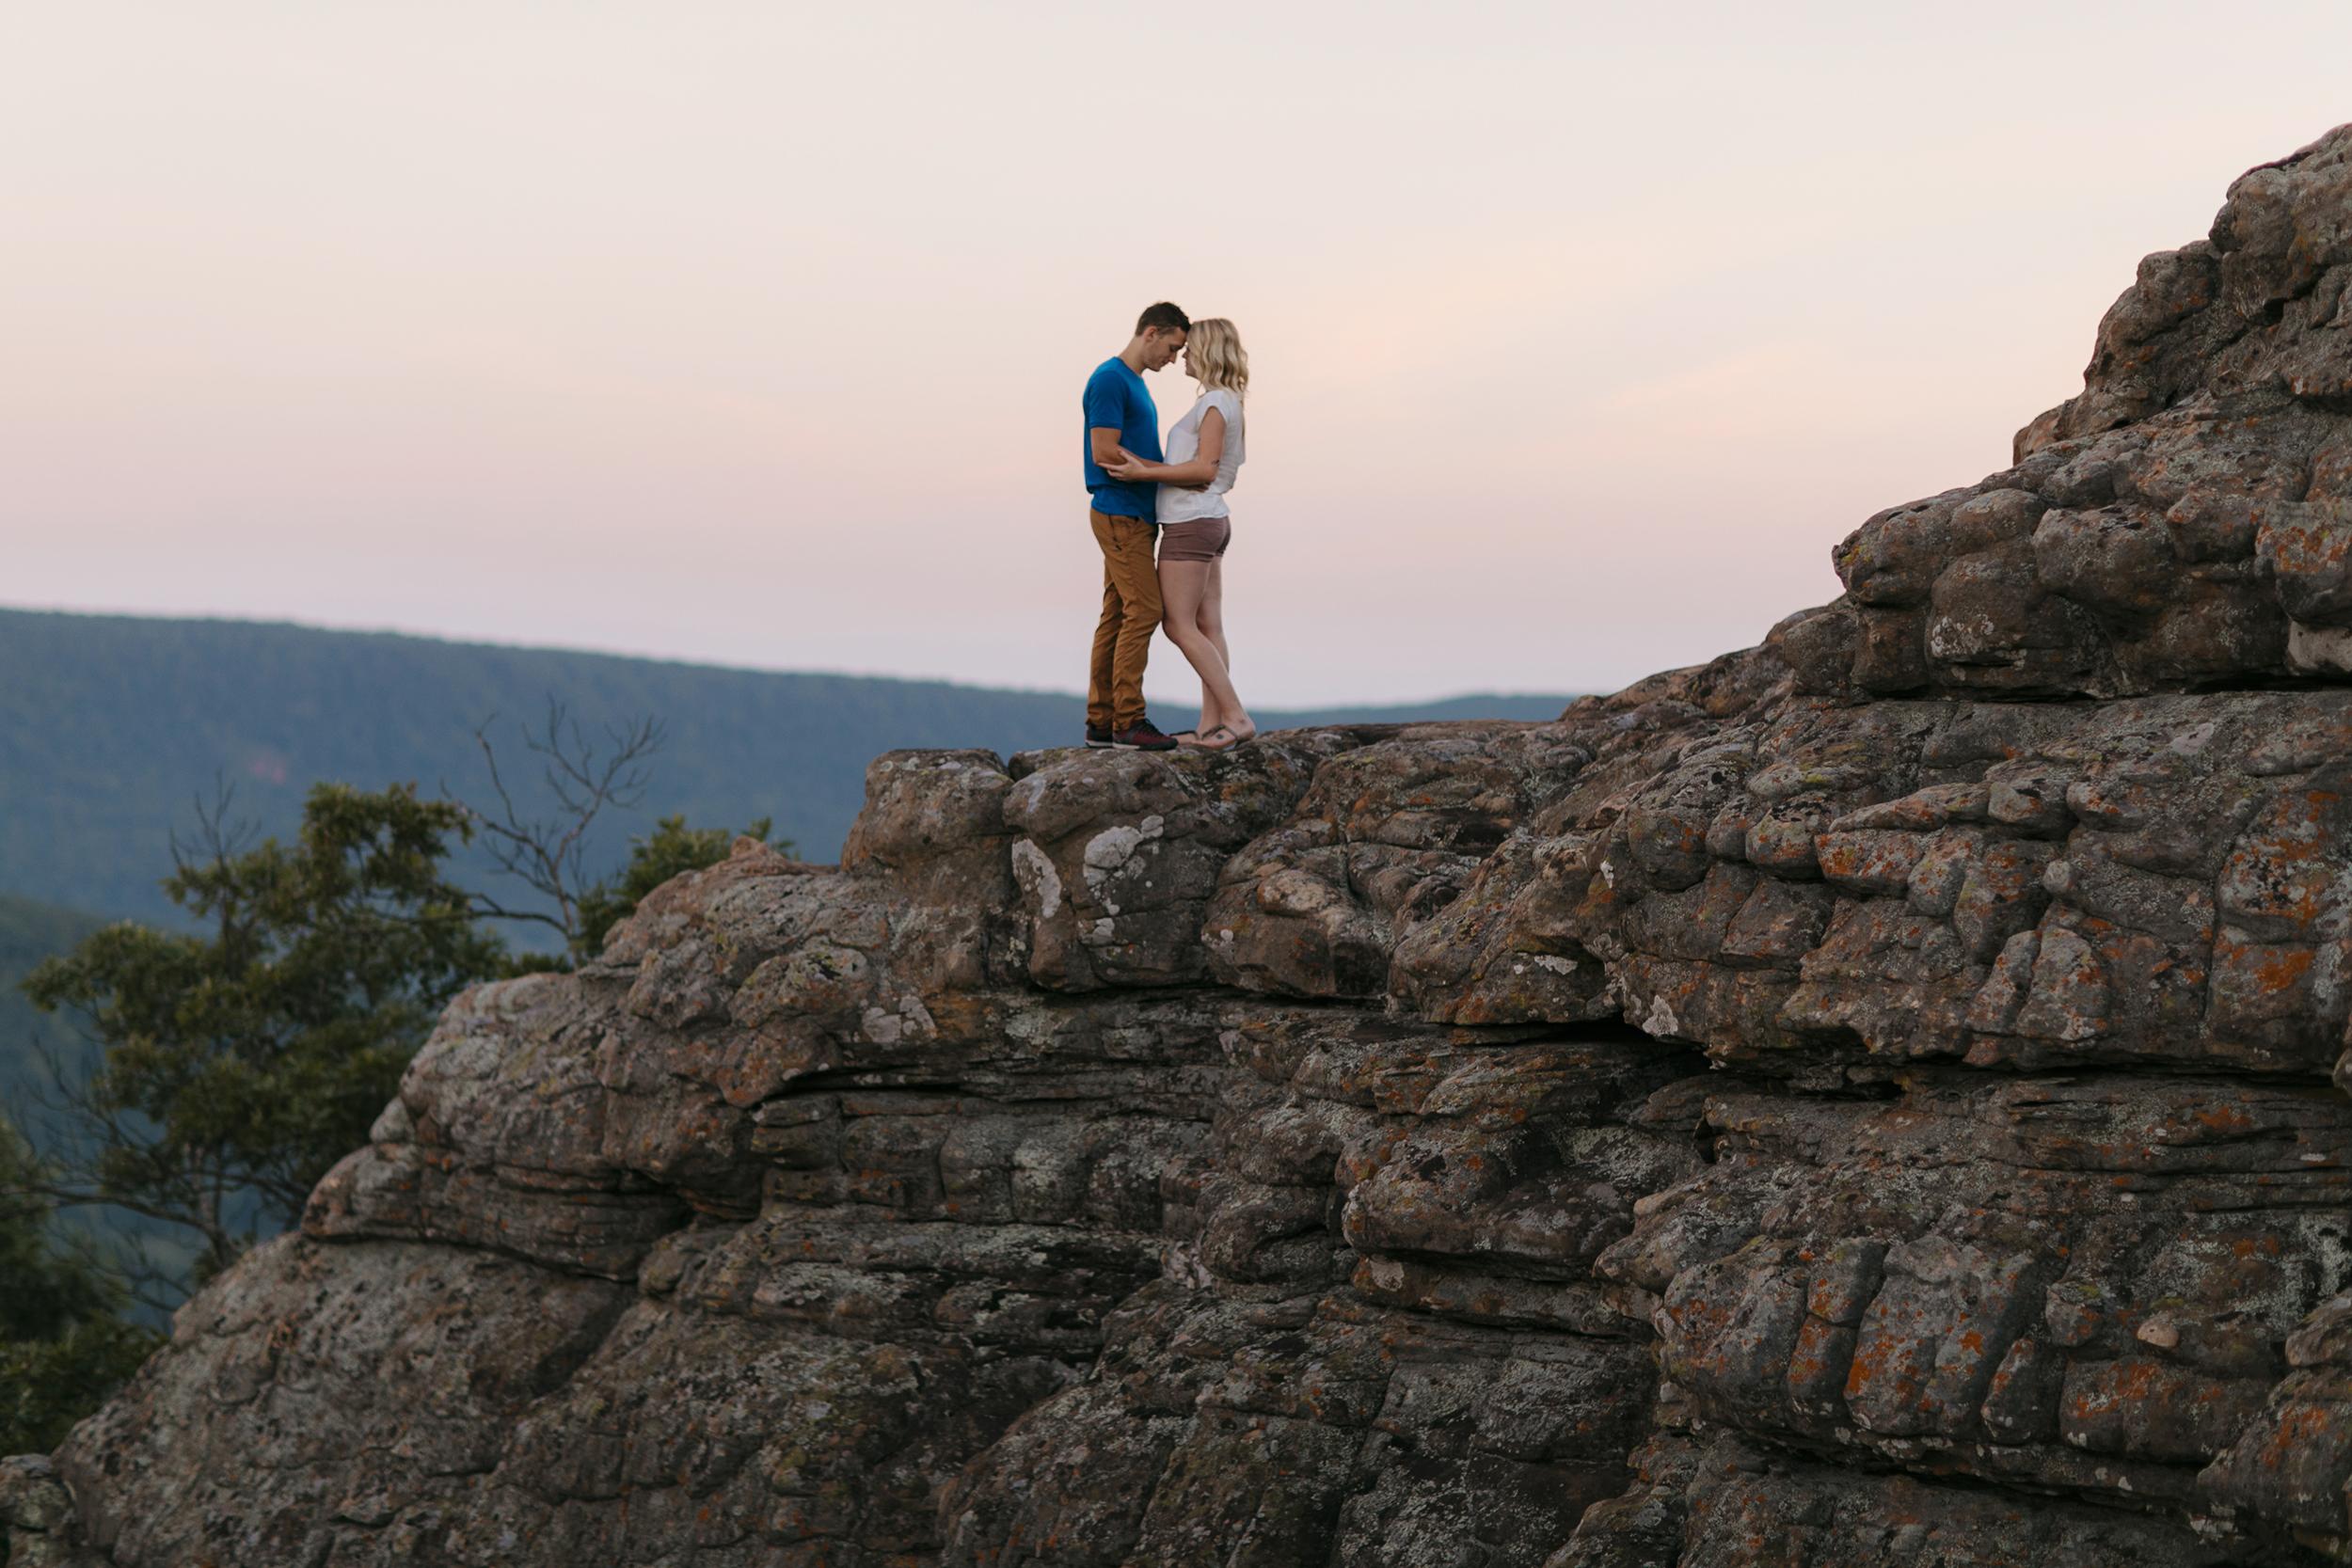 Buffalo-River-Arkansas-Sams-Throne-Adventure-Engagement-Photographer3.JPG